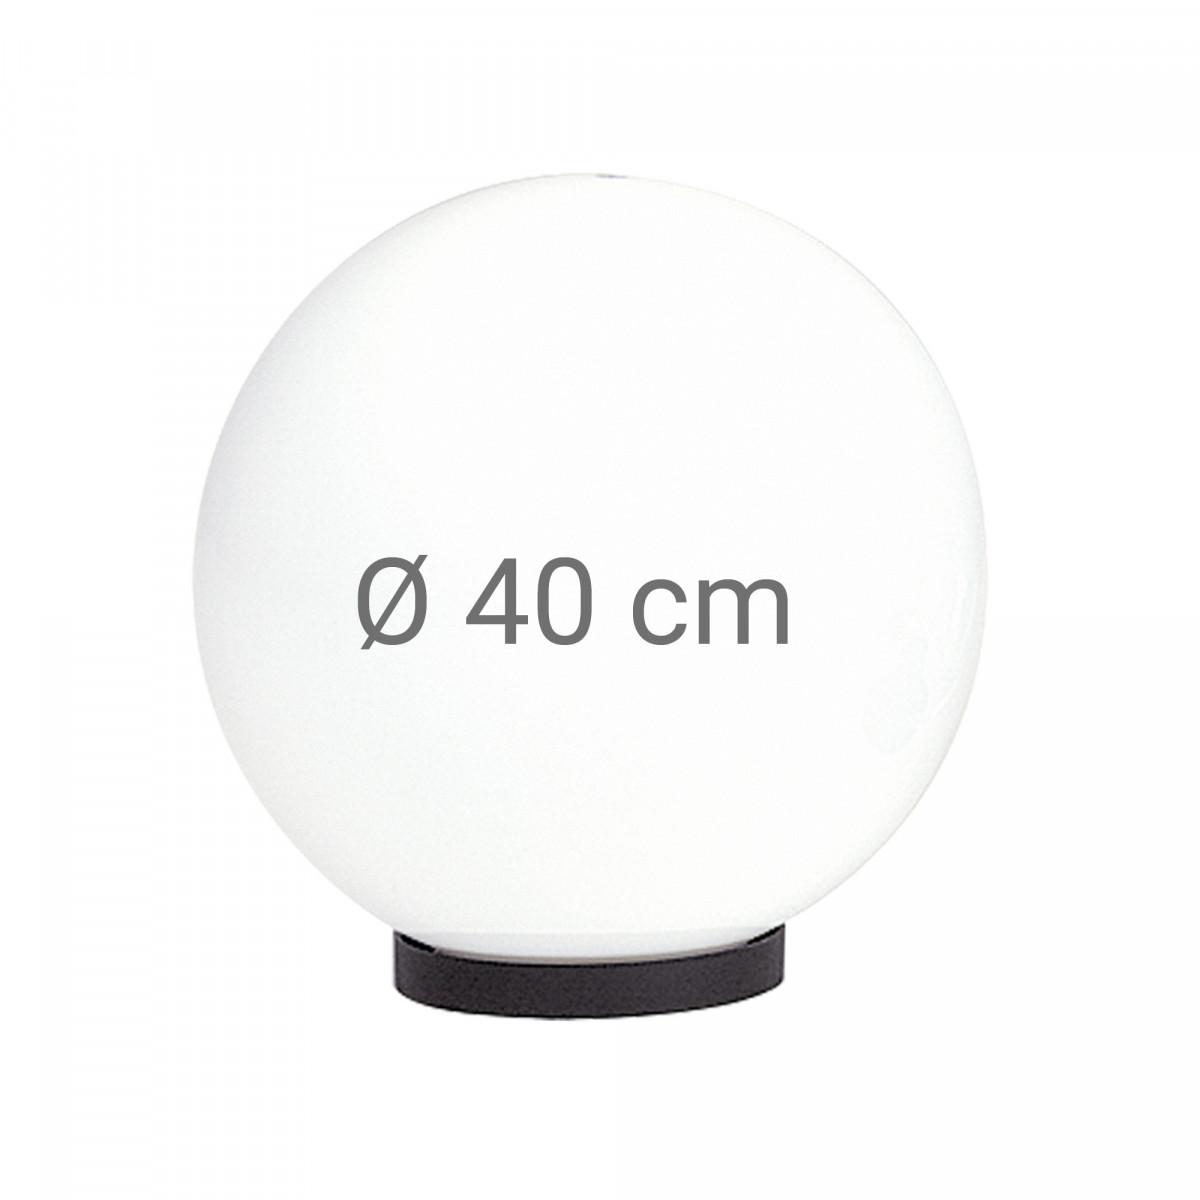 Bol opaal Ø 40 incl. flens (3683) - KS Verlichting - Tuinverlichting Bol